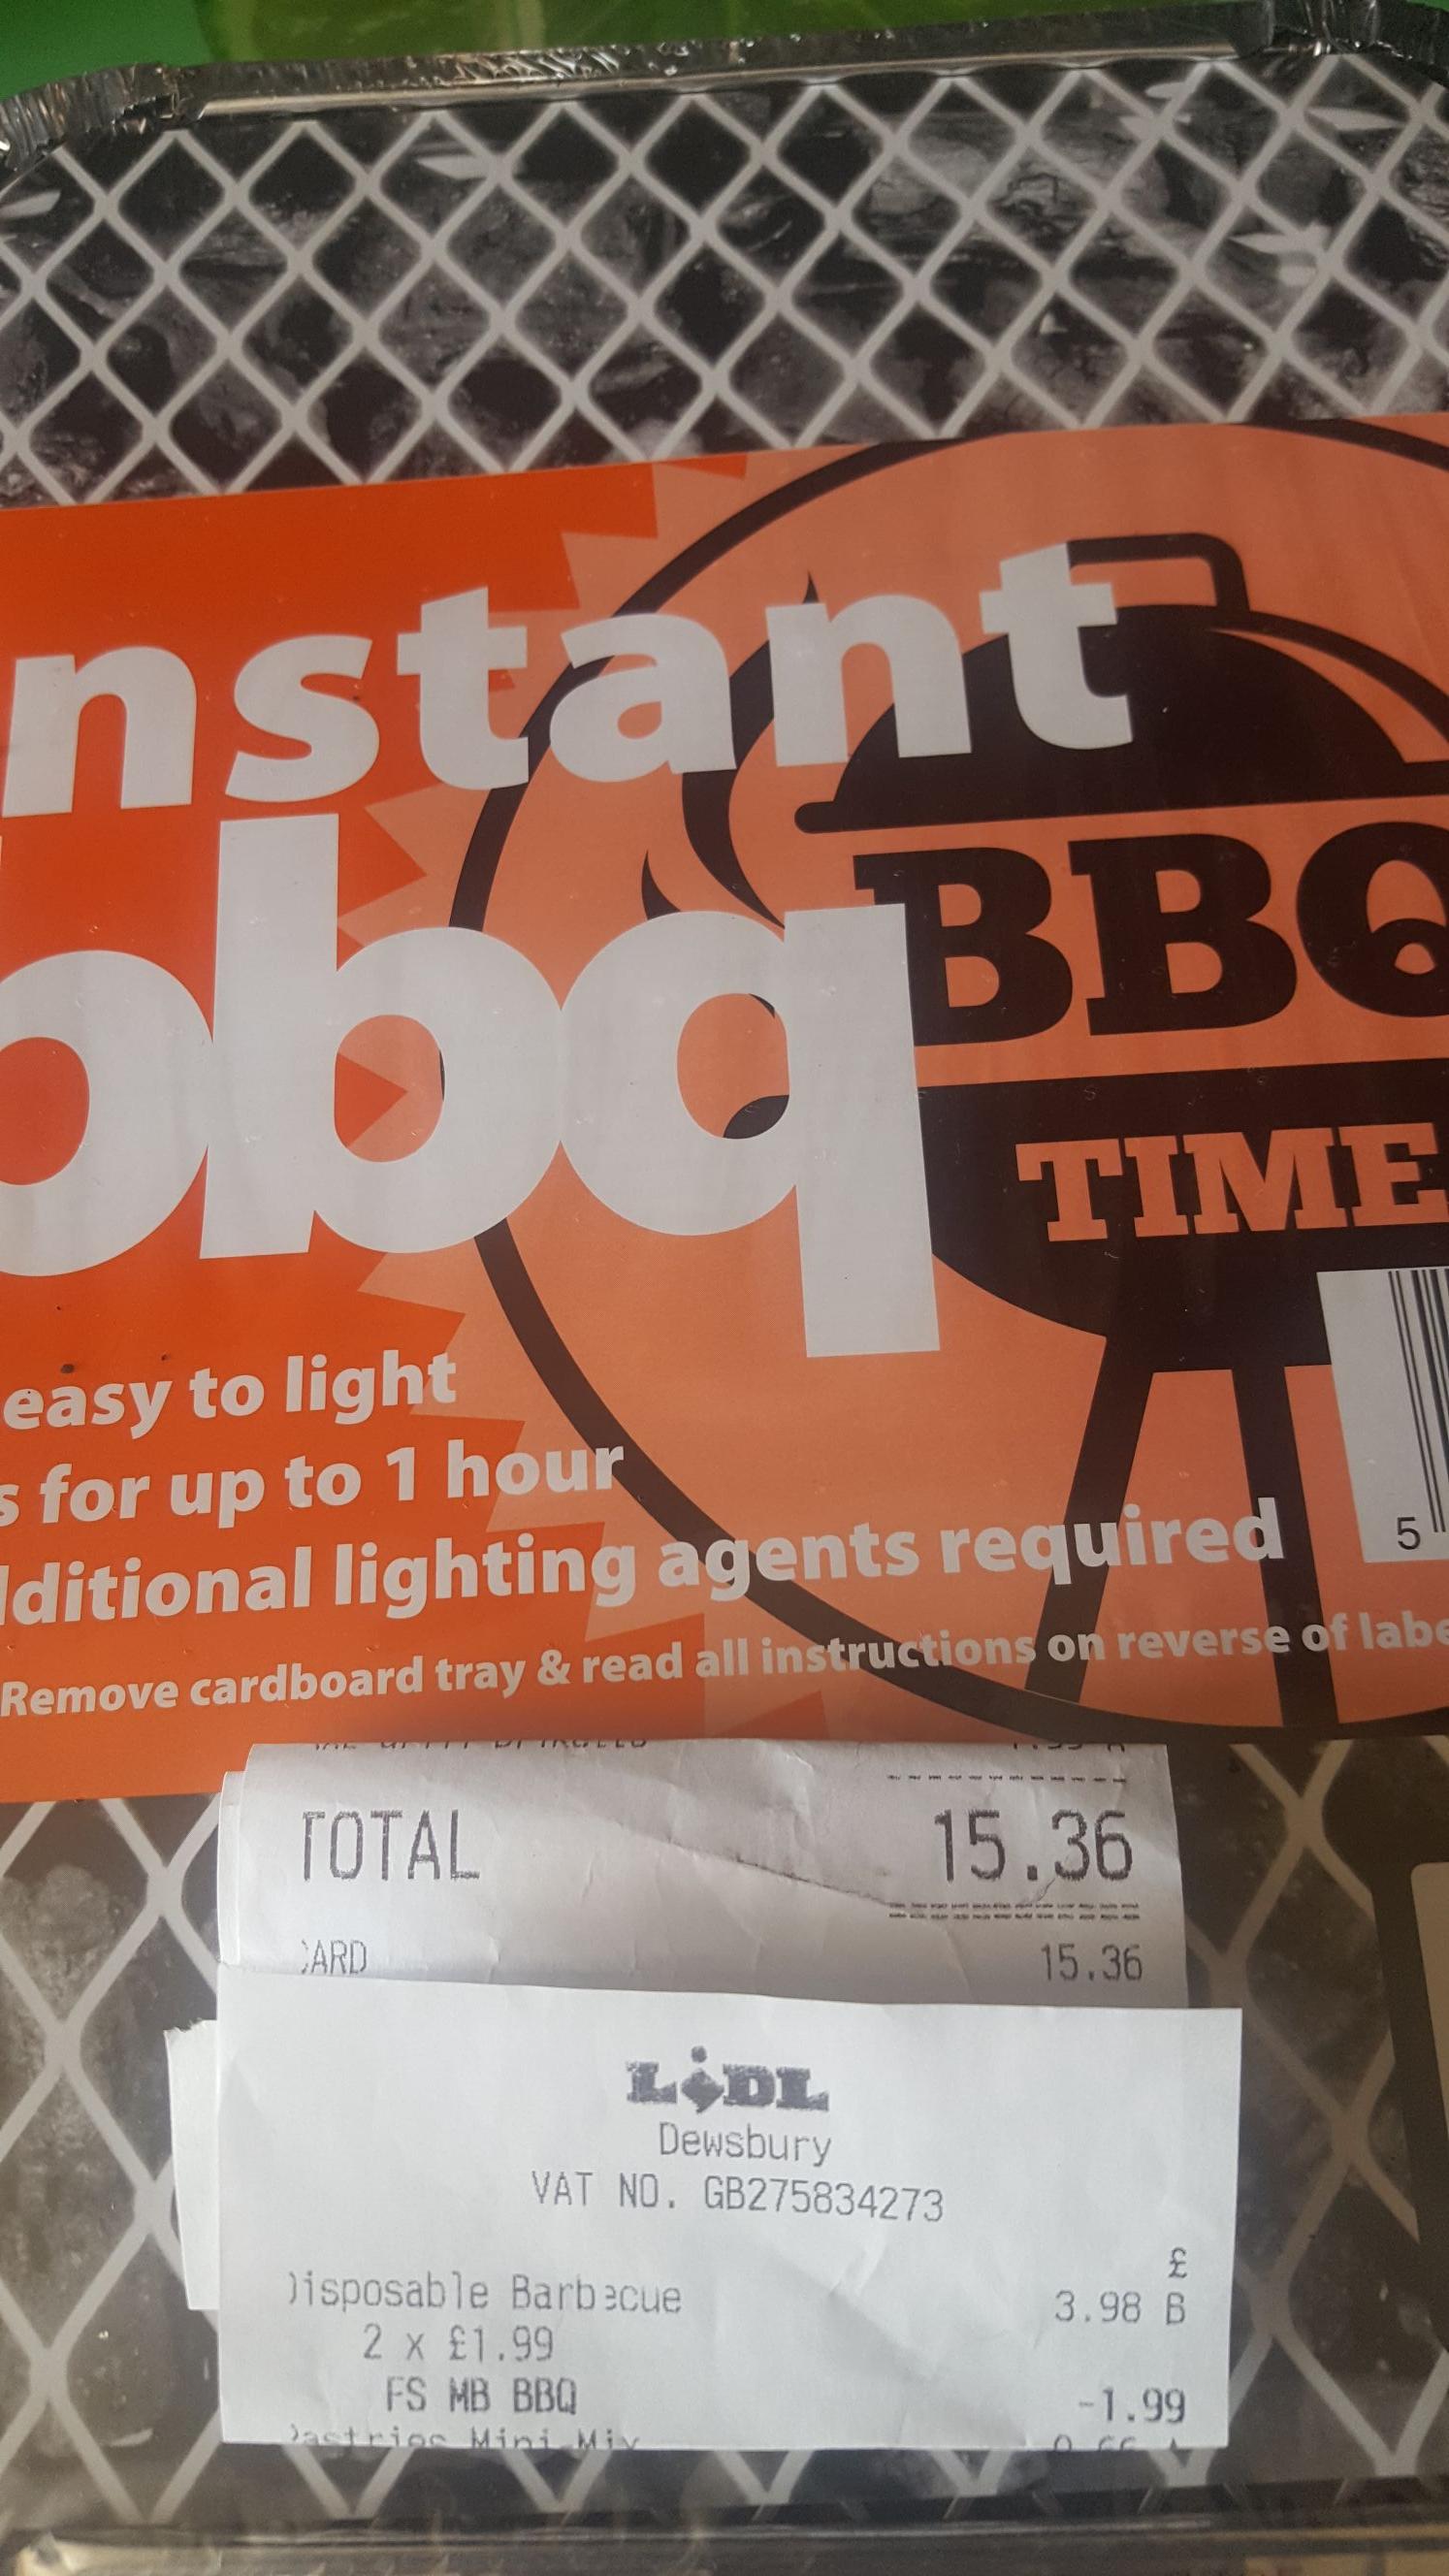 Instant bbq 2 for £1.99 instore @ Lidl Dewsbury - bogof